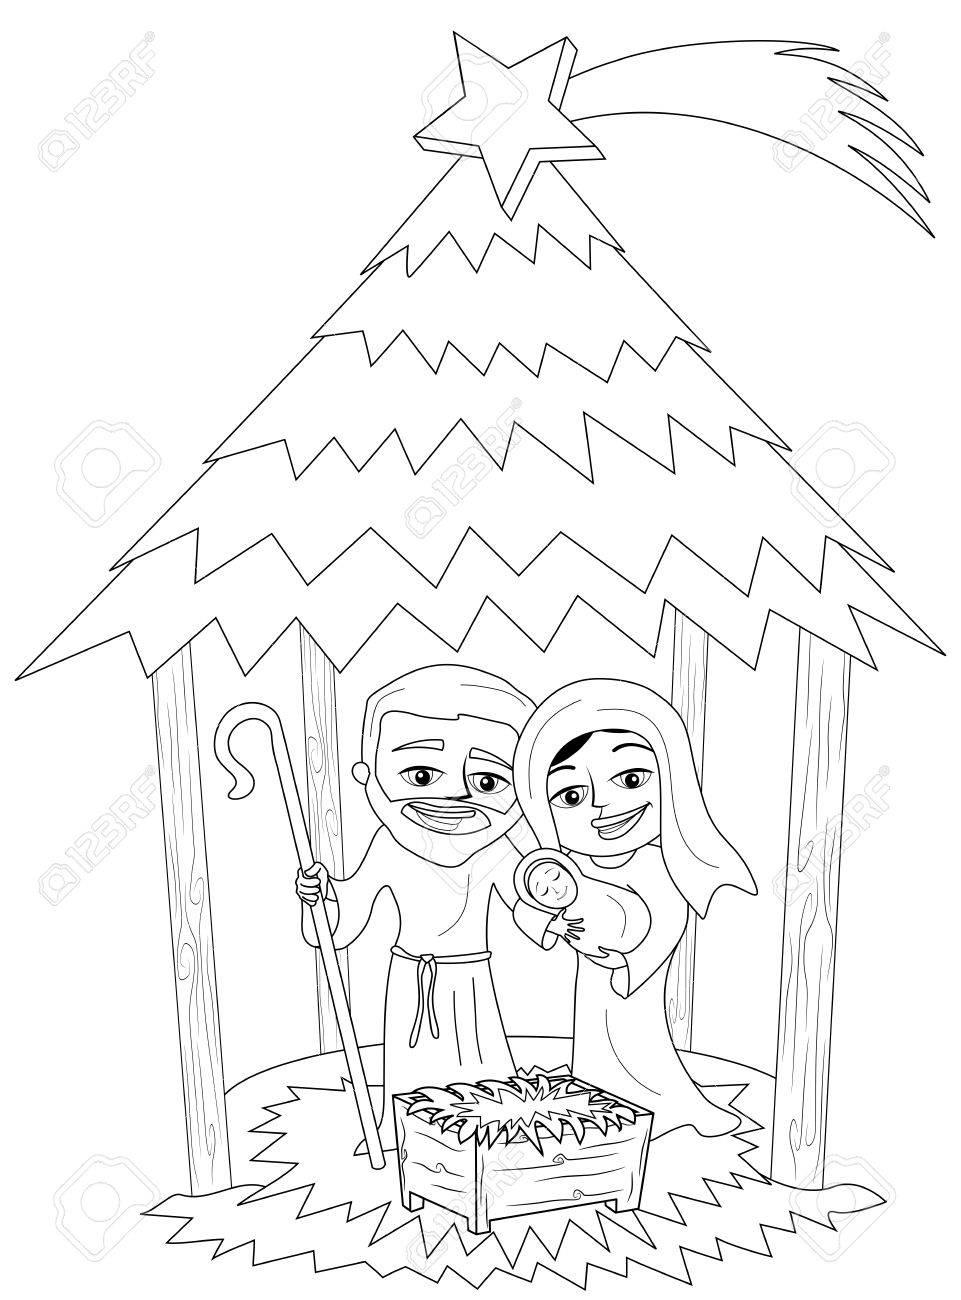 961x1300 Christmas Nativity Scene With Joseph And Mary Holding Newborn